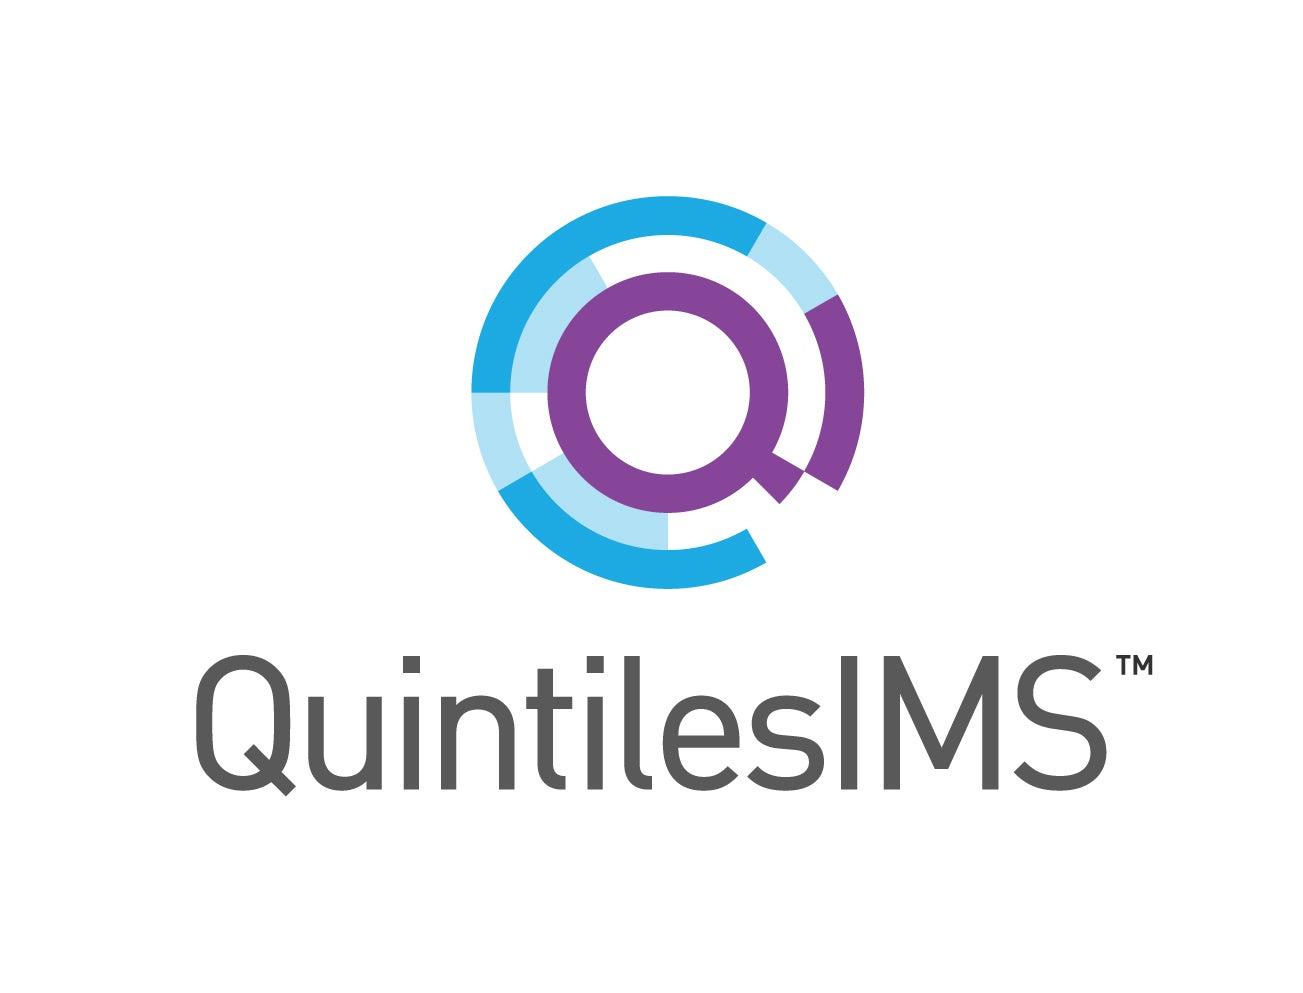 QuintilesIMS-VERT.jpg